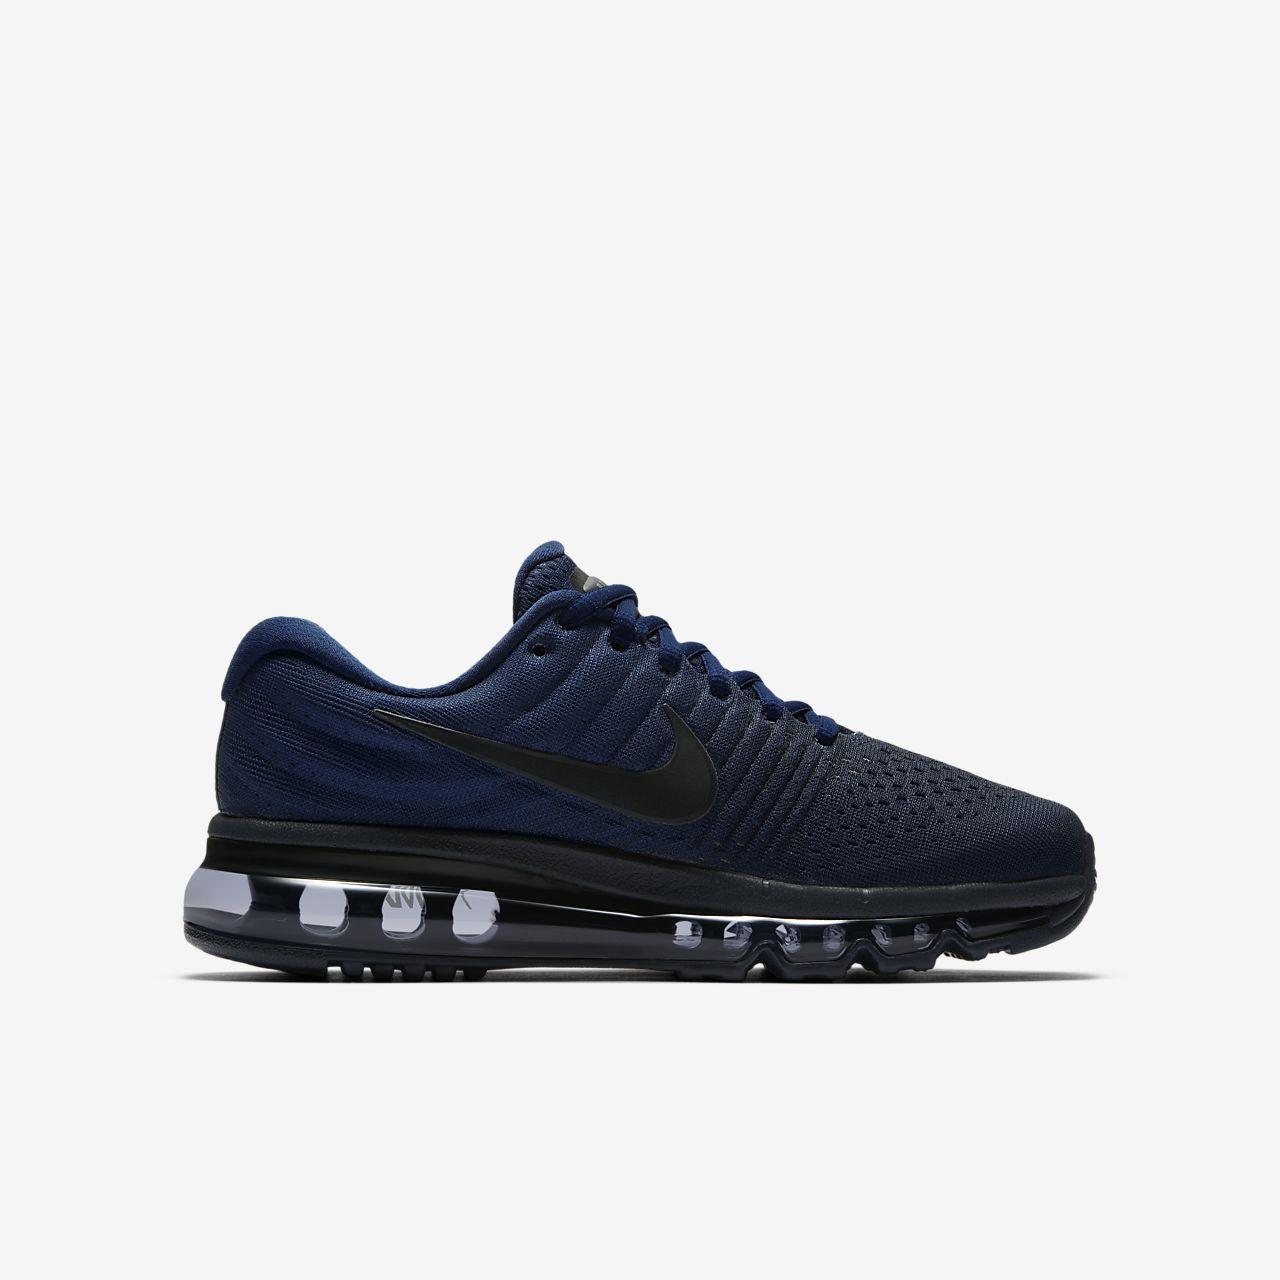 nike air max 2017 zwart blauw